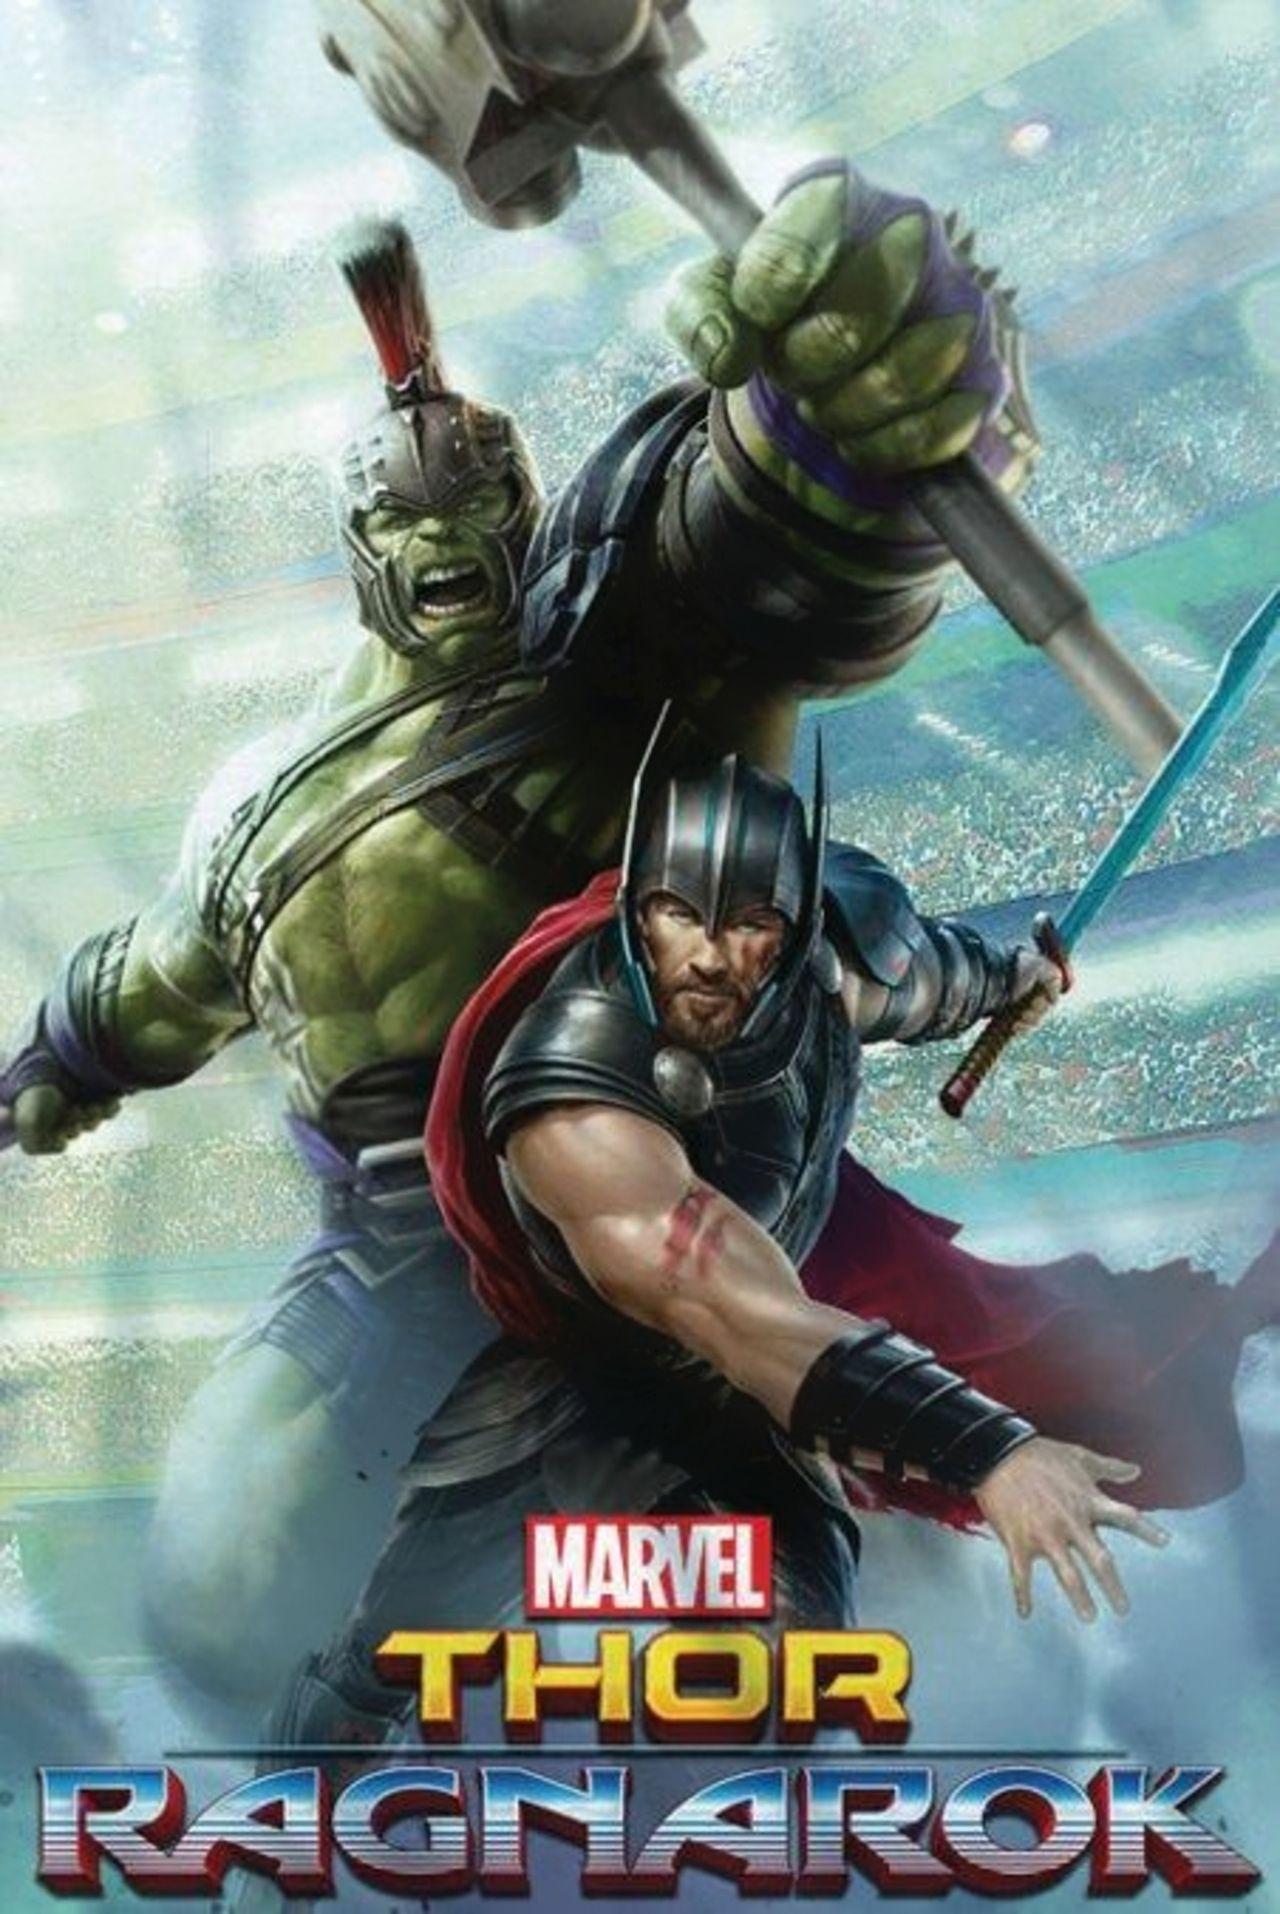 hulk vs thor hulk vs wolverine dvdrip rmvb dublado